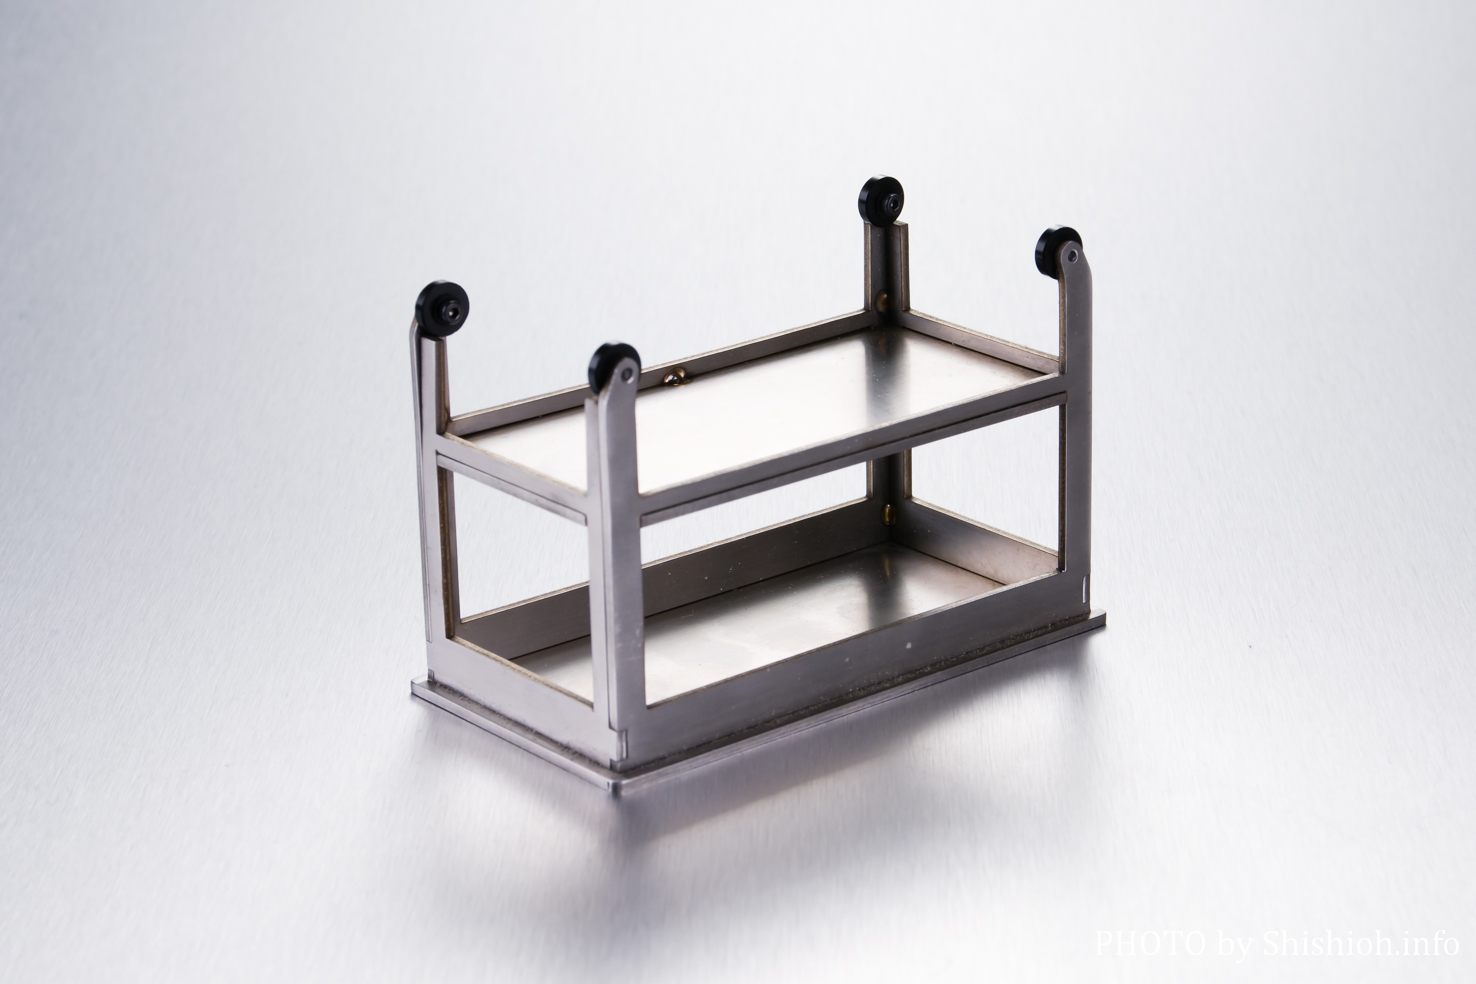 NOVA フィギュア用アクセサリー 机(サンプル)